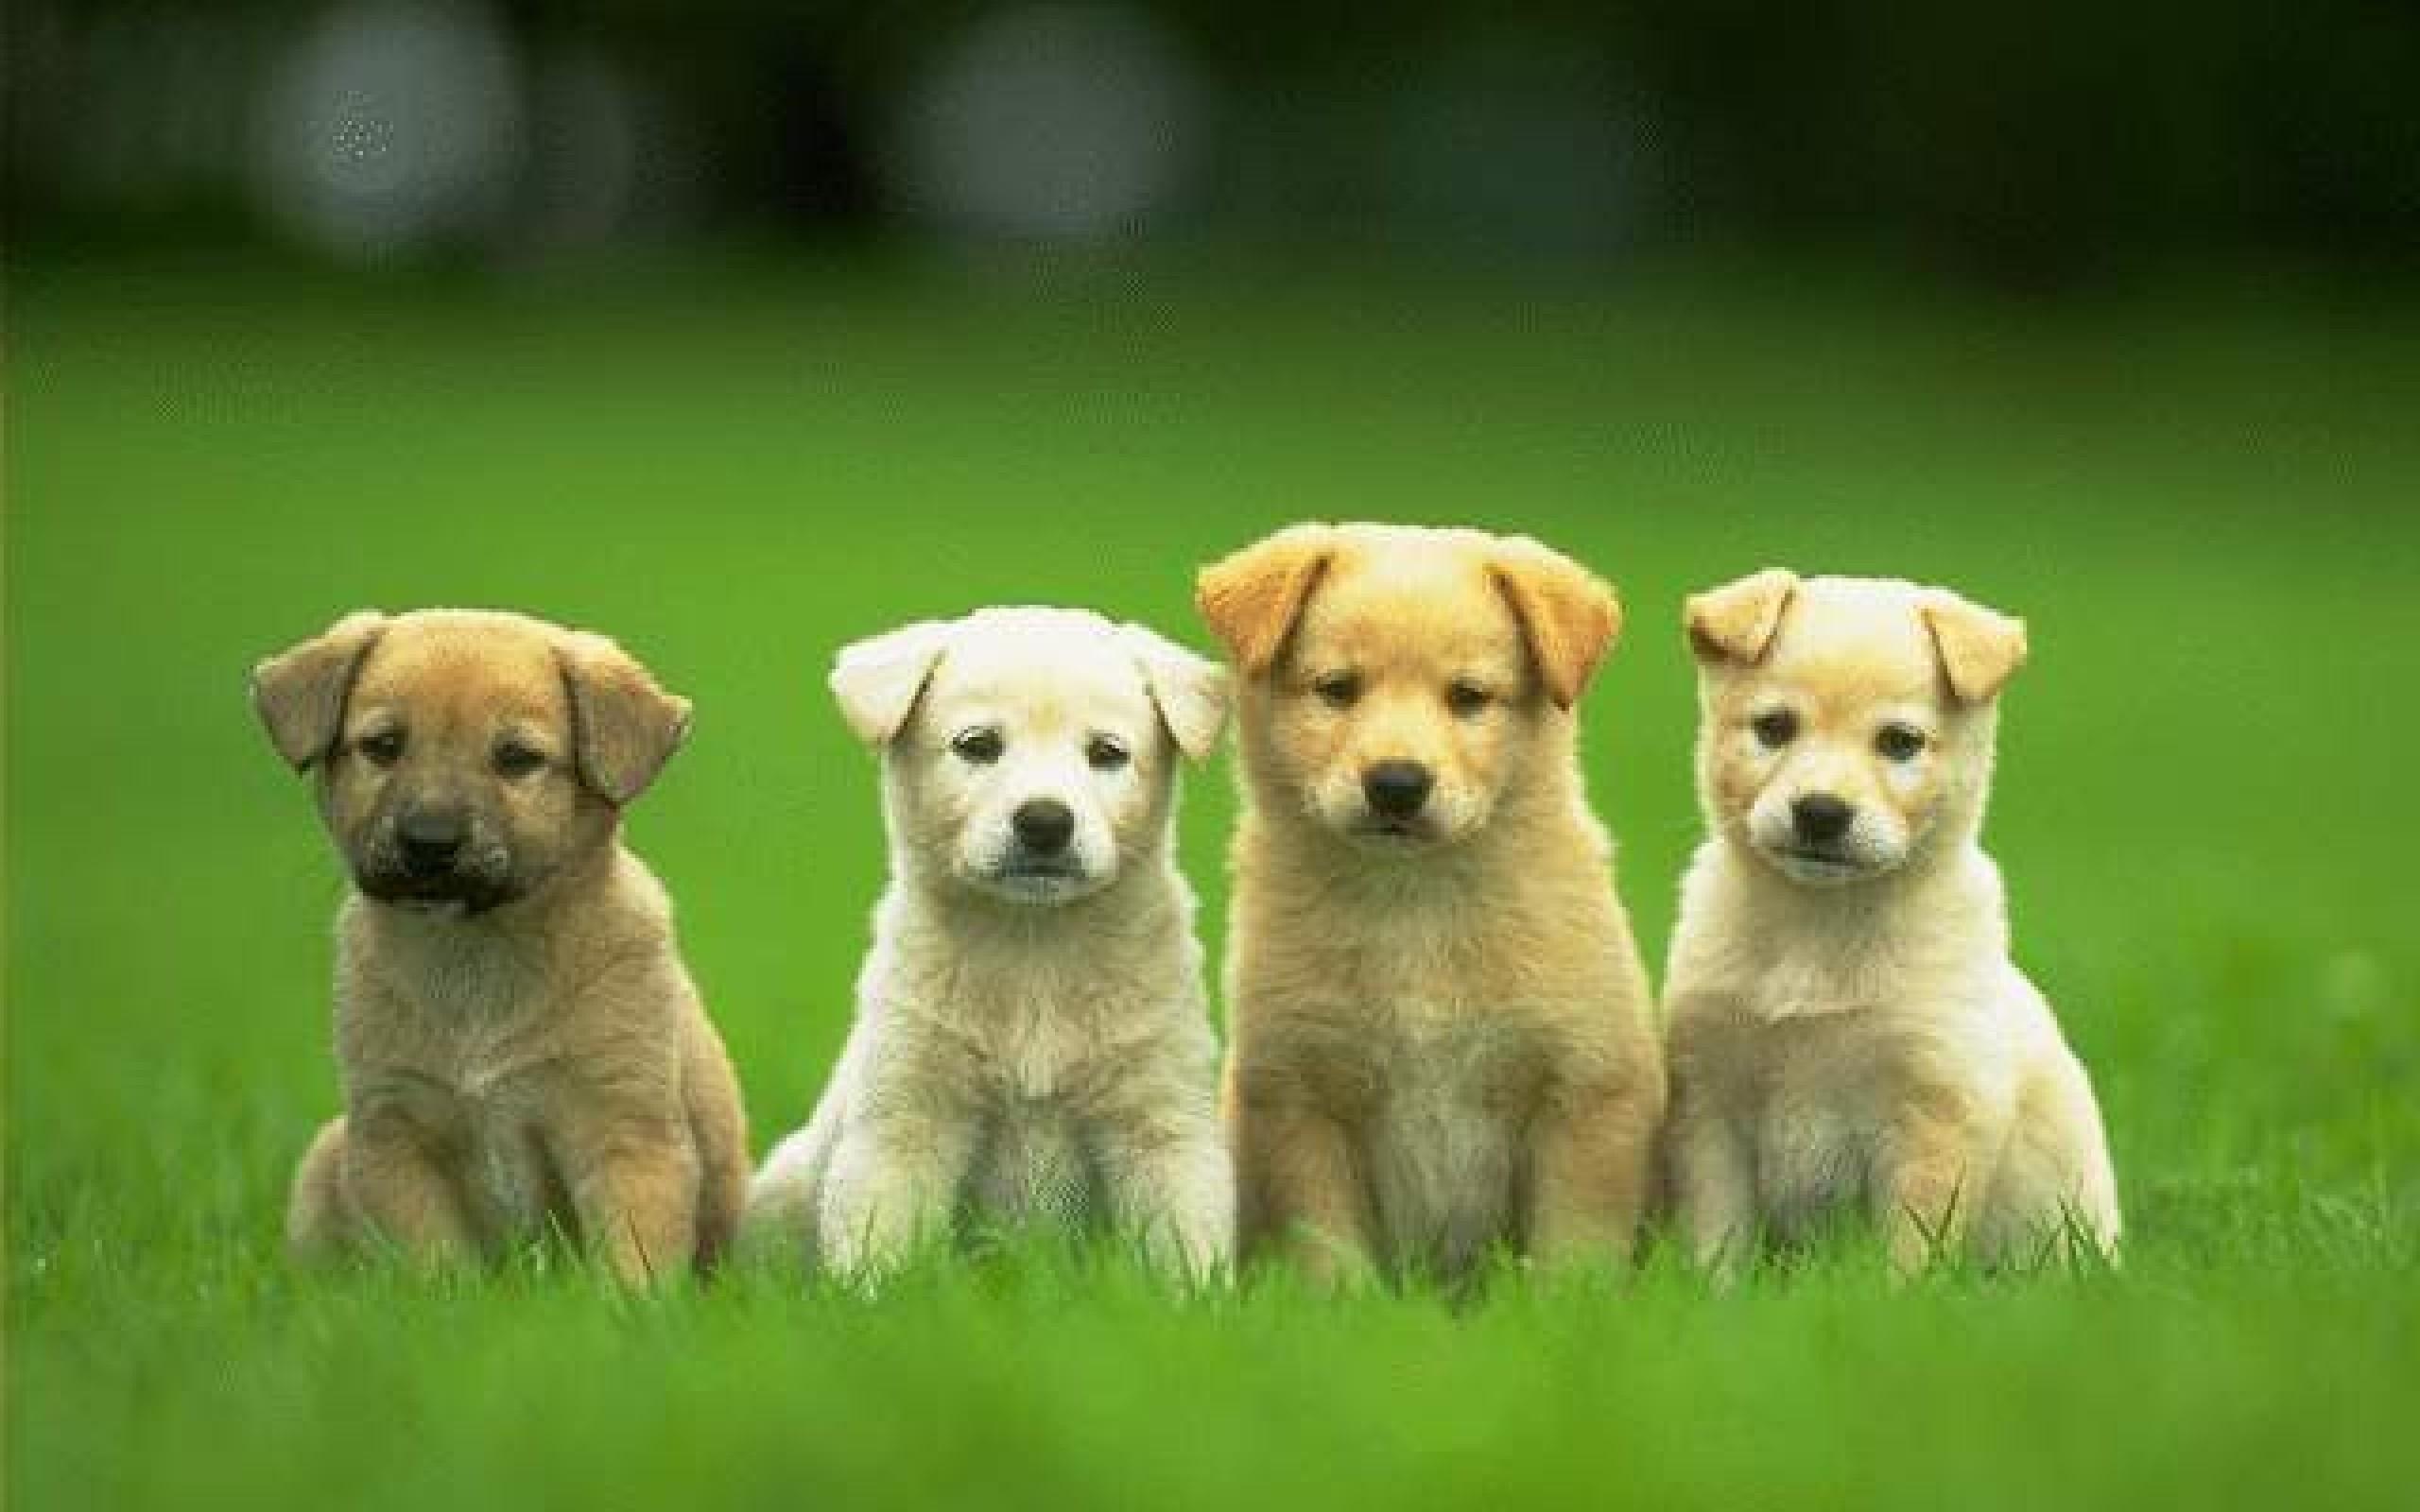 hd cute dog wallpapers free for desktop - hd wallpaper